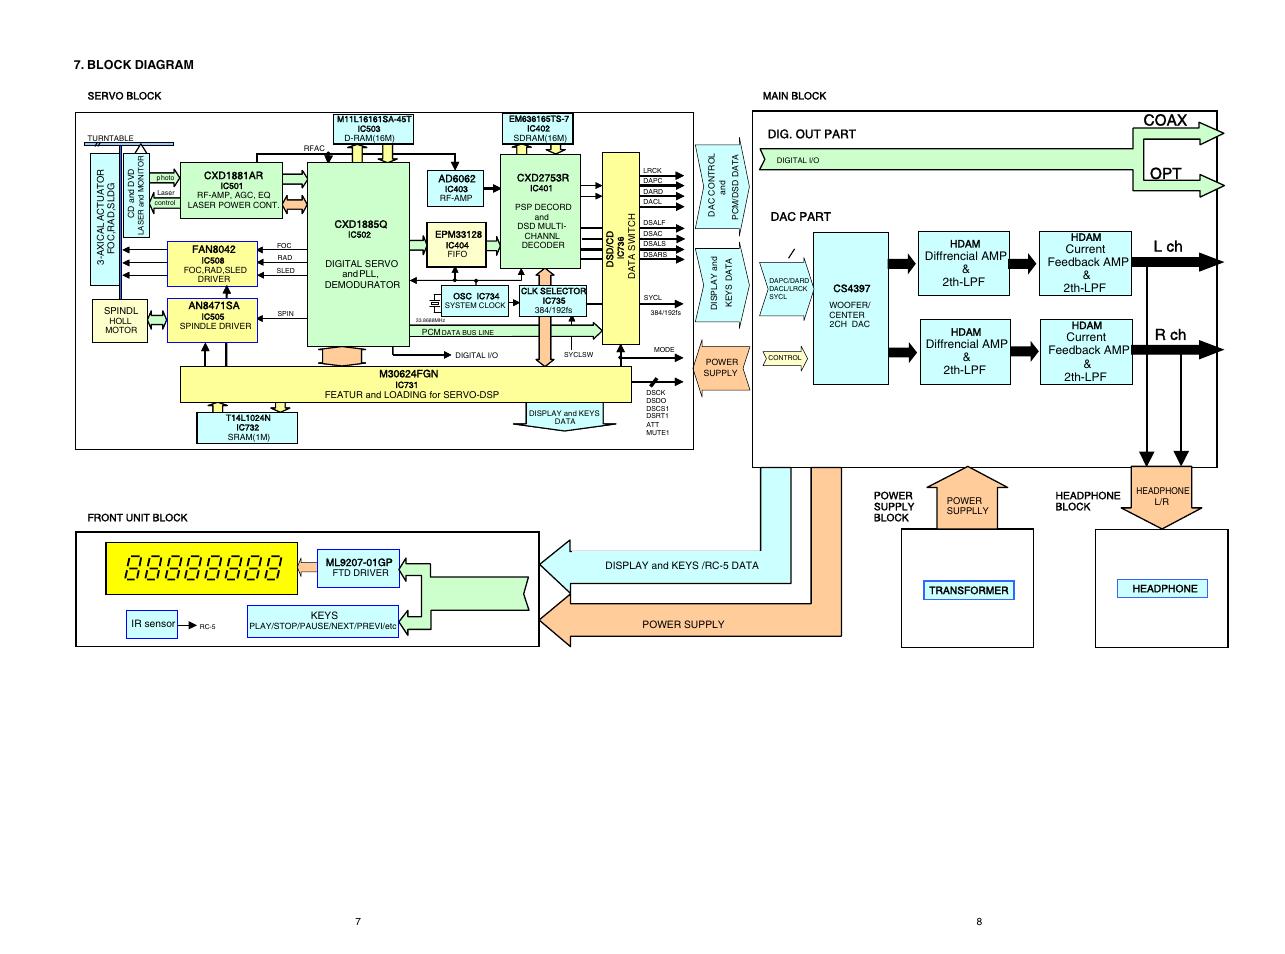 l ch r ch coax opt, block diagram, diffrencial amp & 2th-lpf | marantz  super audio cd player sa8400 user manual | page 9 / 65